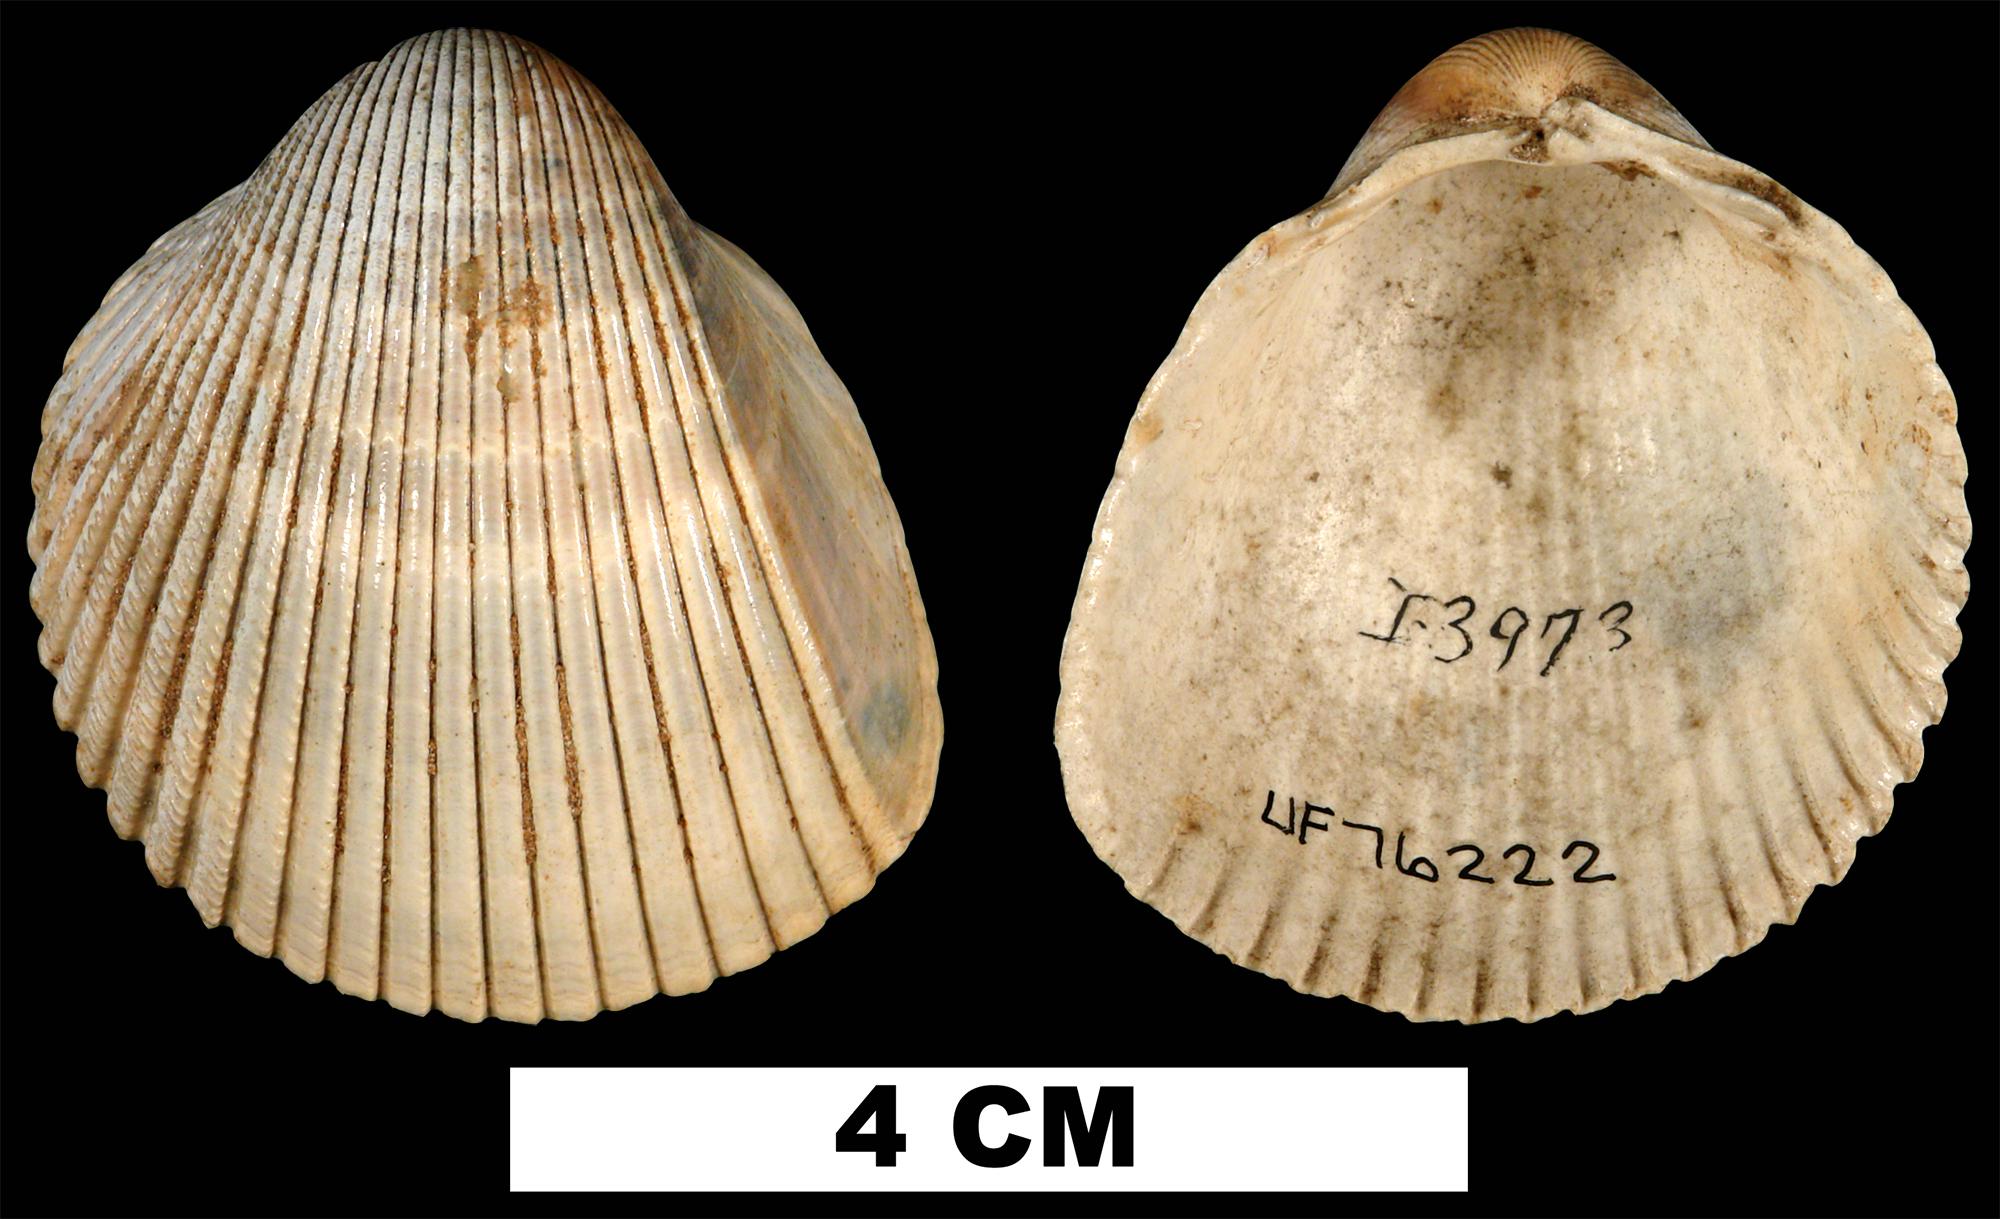 <i>Dinocardium chipolanum</i> from the Early Miocene Chipola Fm. of Calhoun County, Florida (UF 76222).